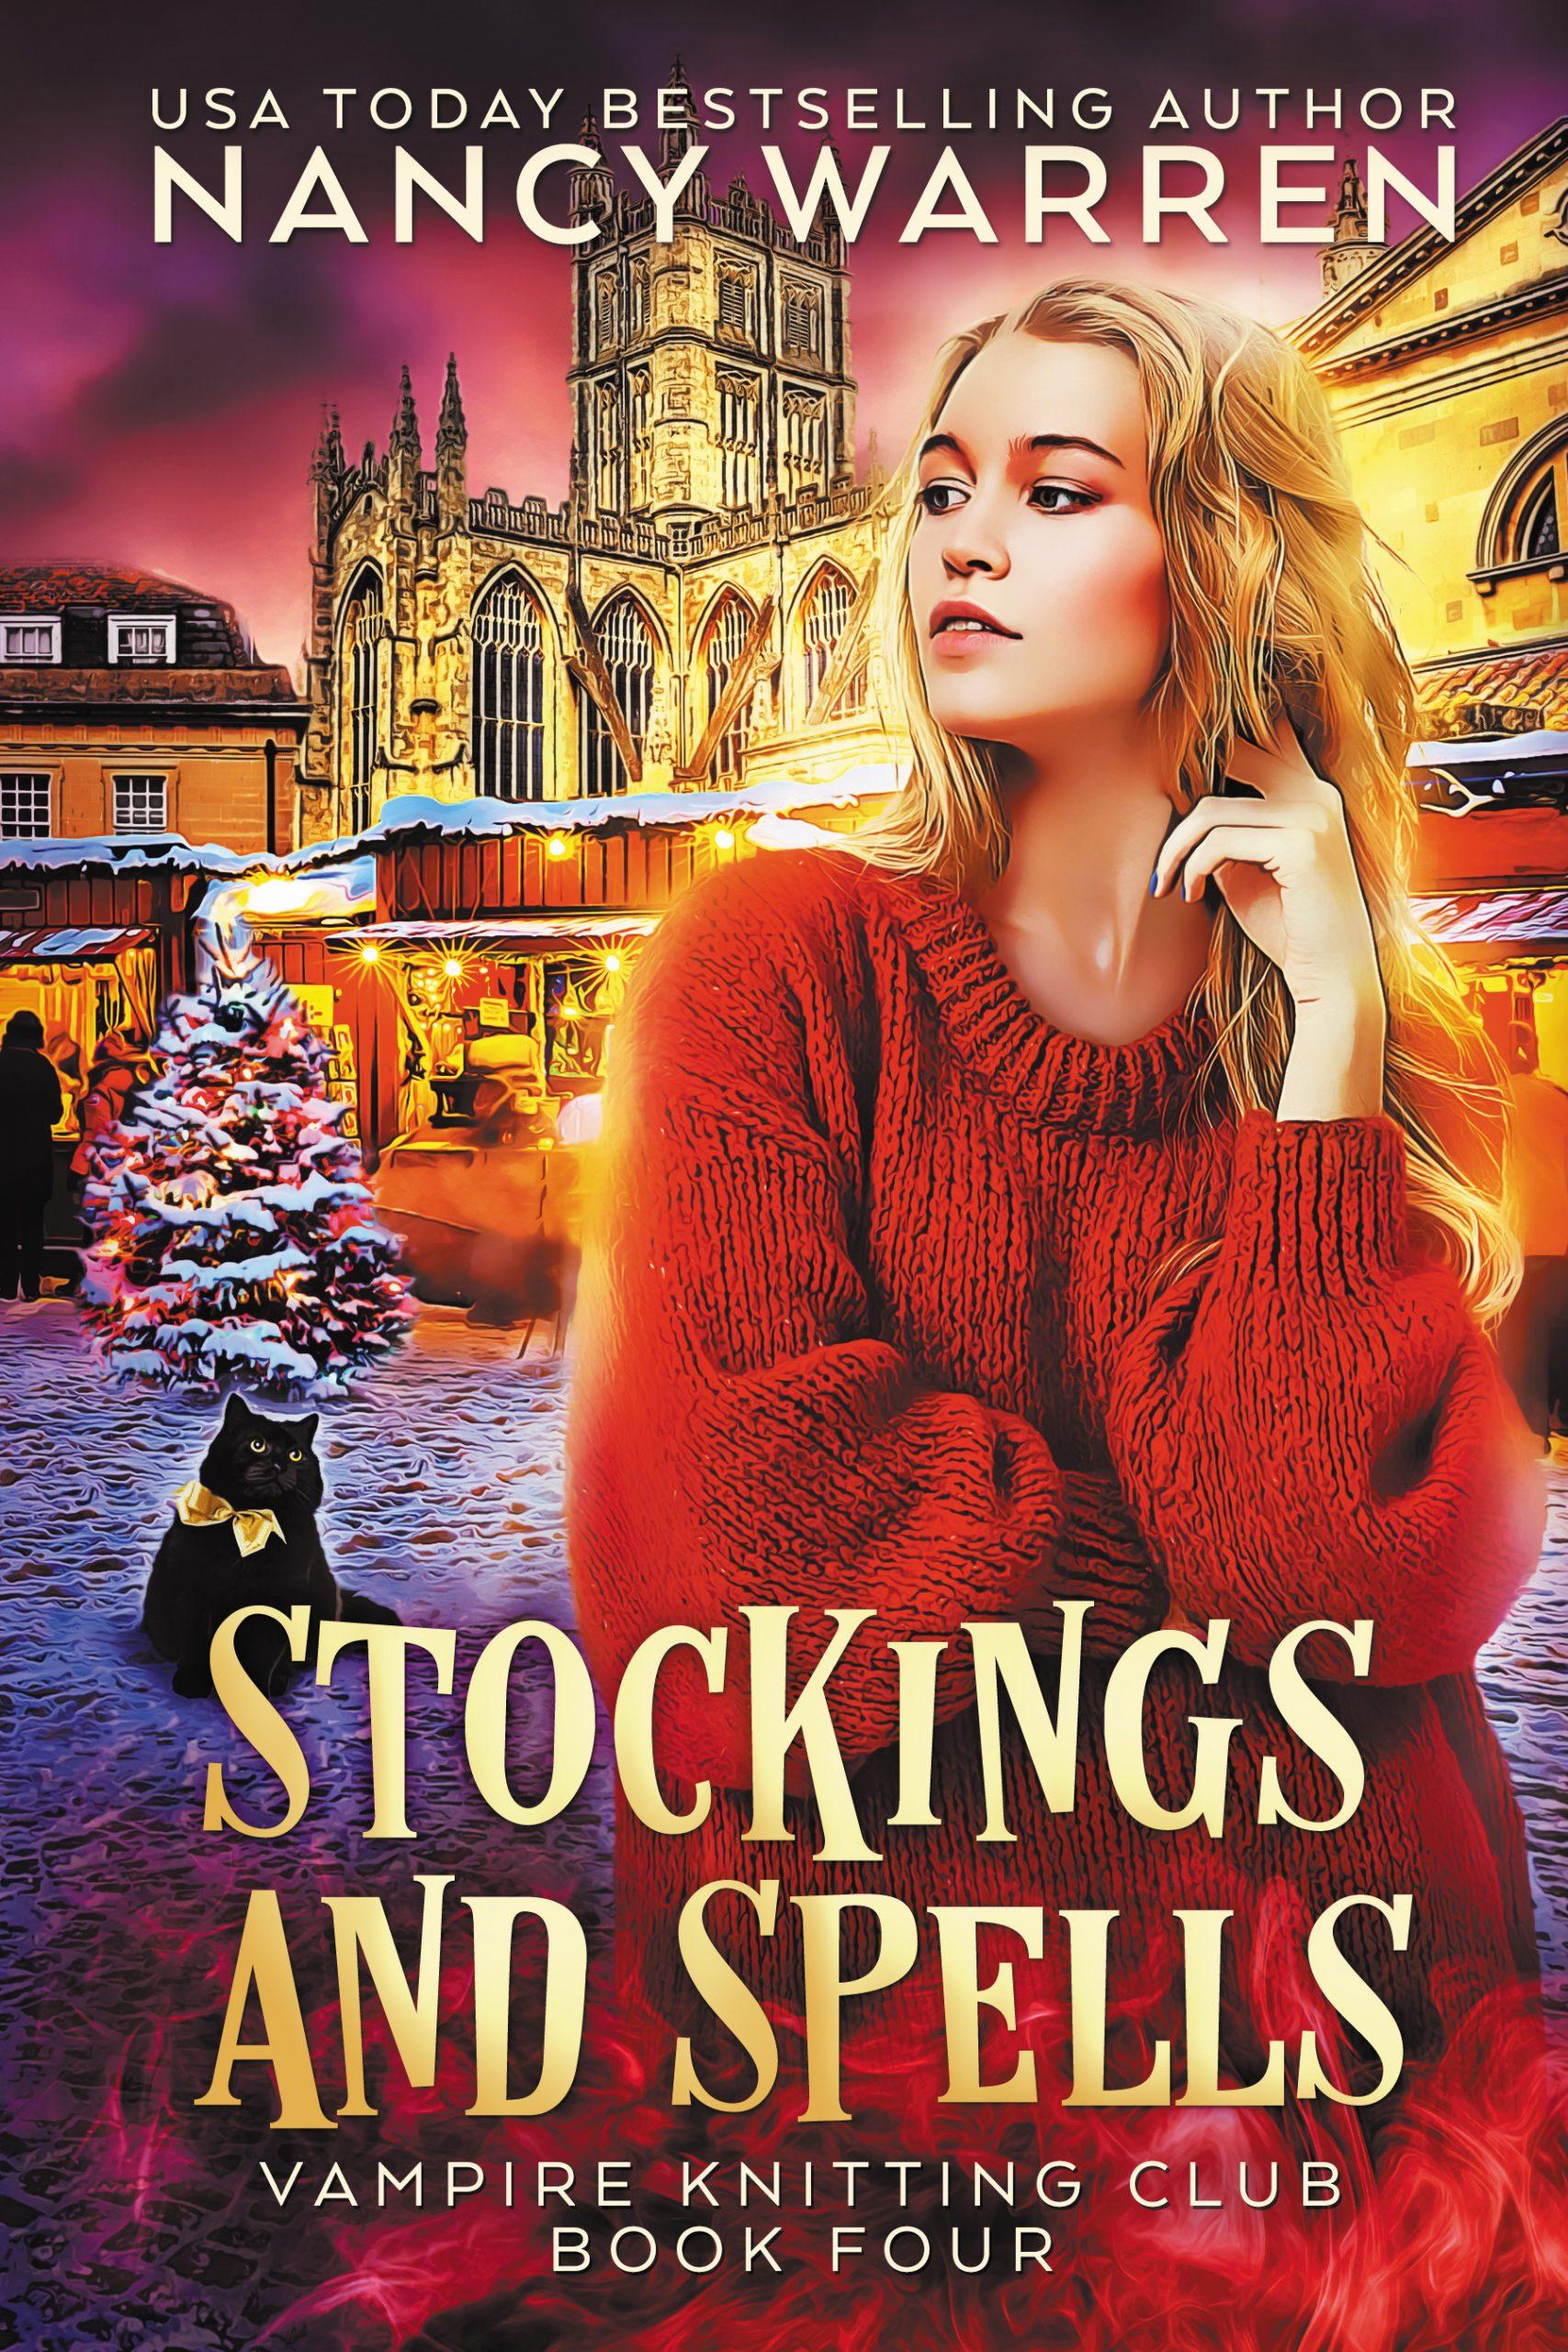 Stockings and Spells (Vampire Knitting Club Book 4)